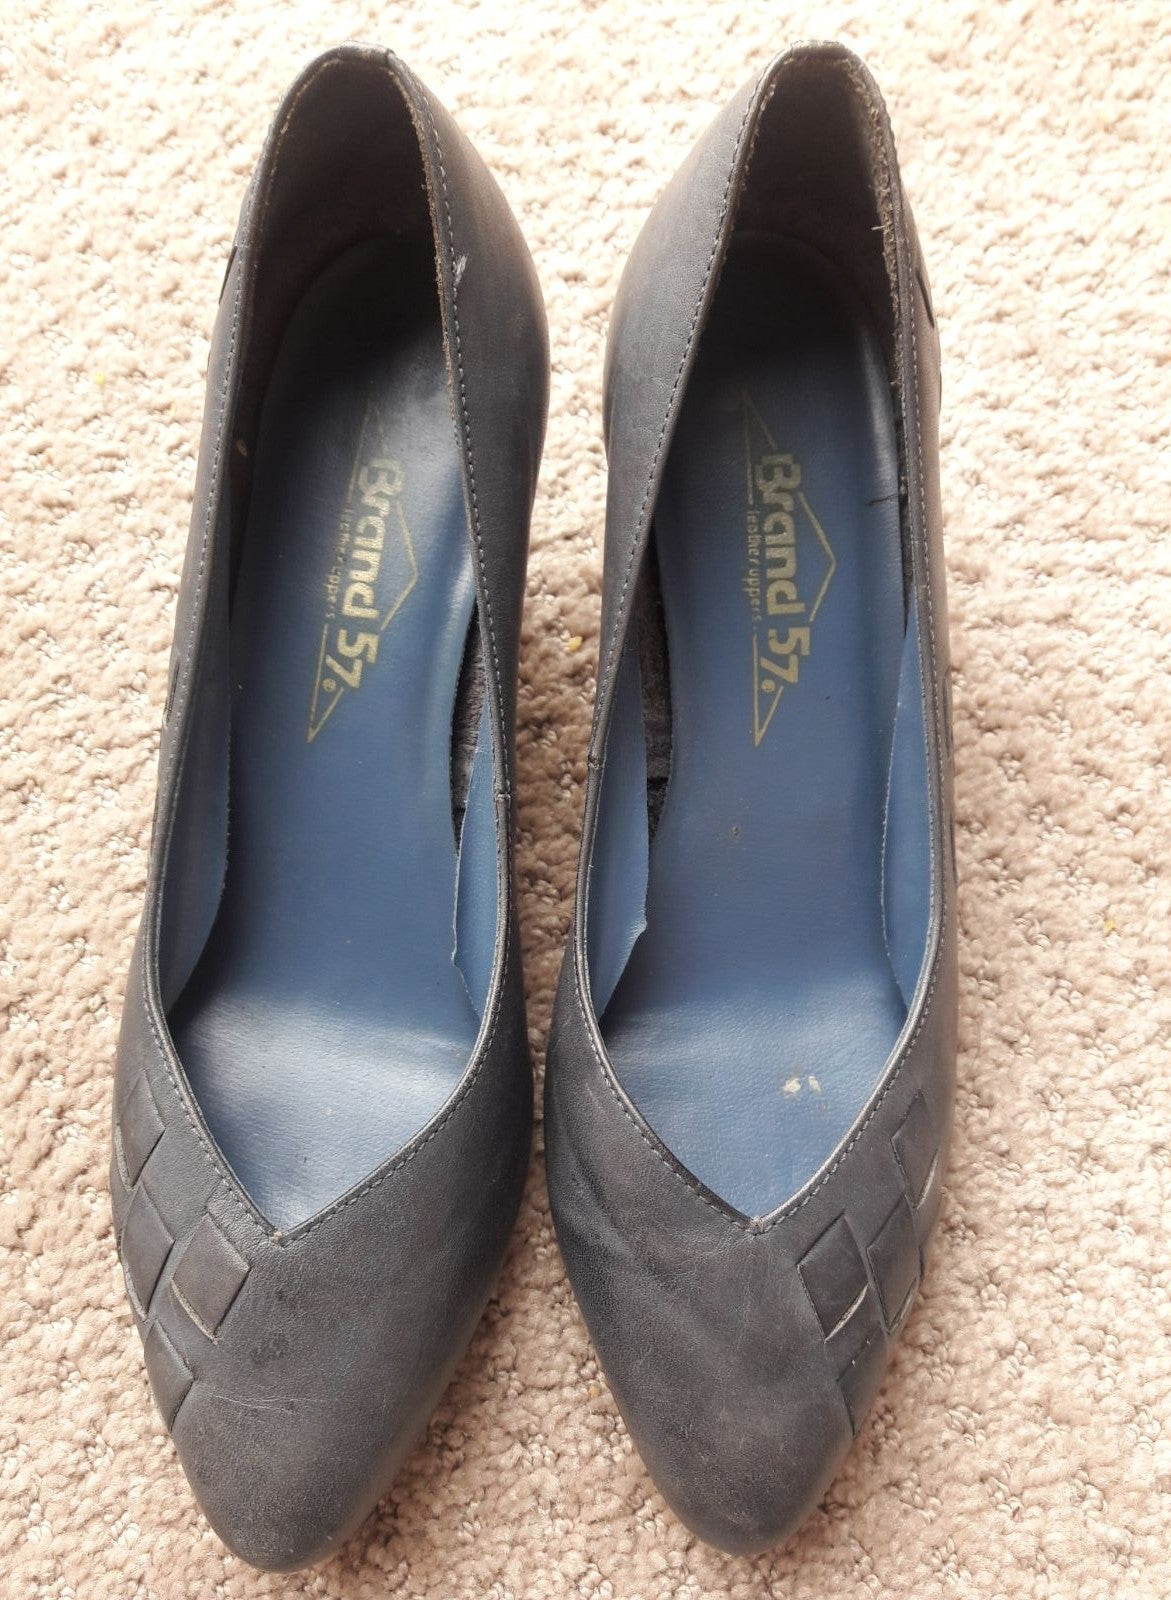 Shoes women Leather pump heels 7 vintage